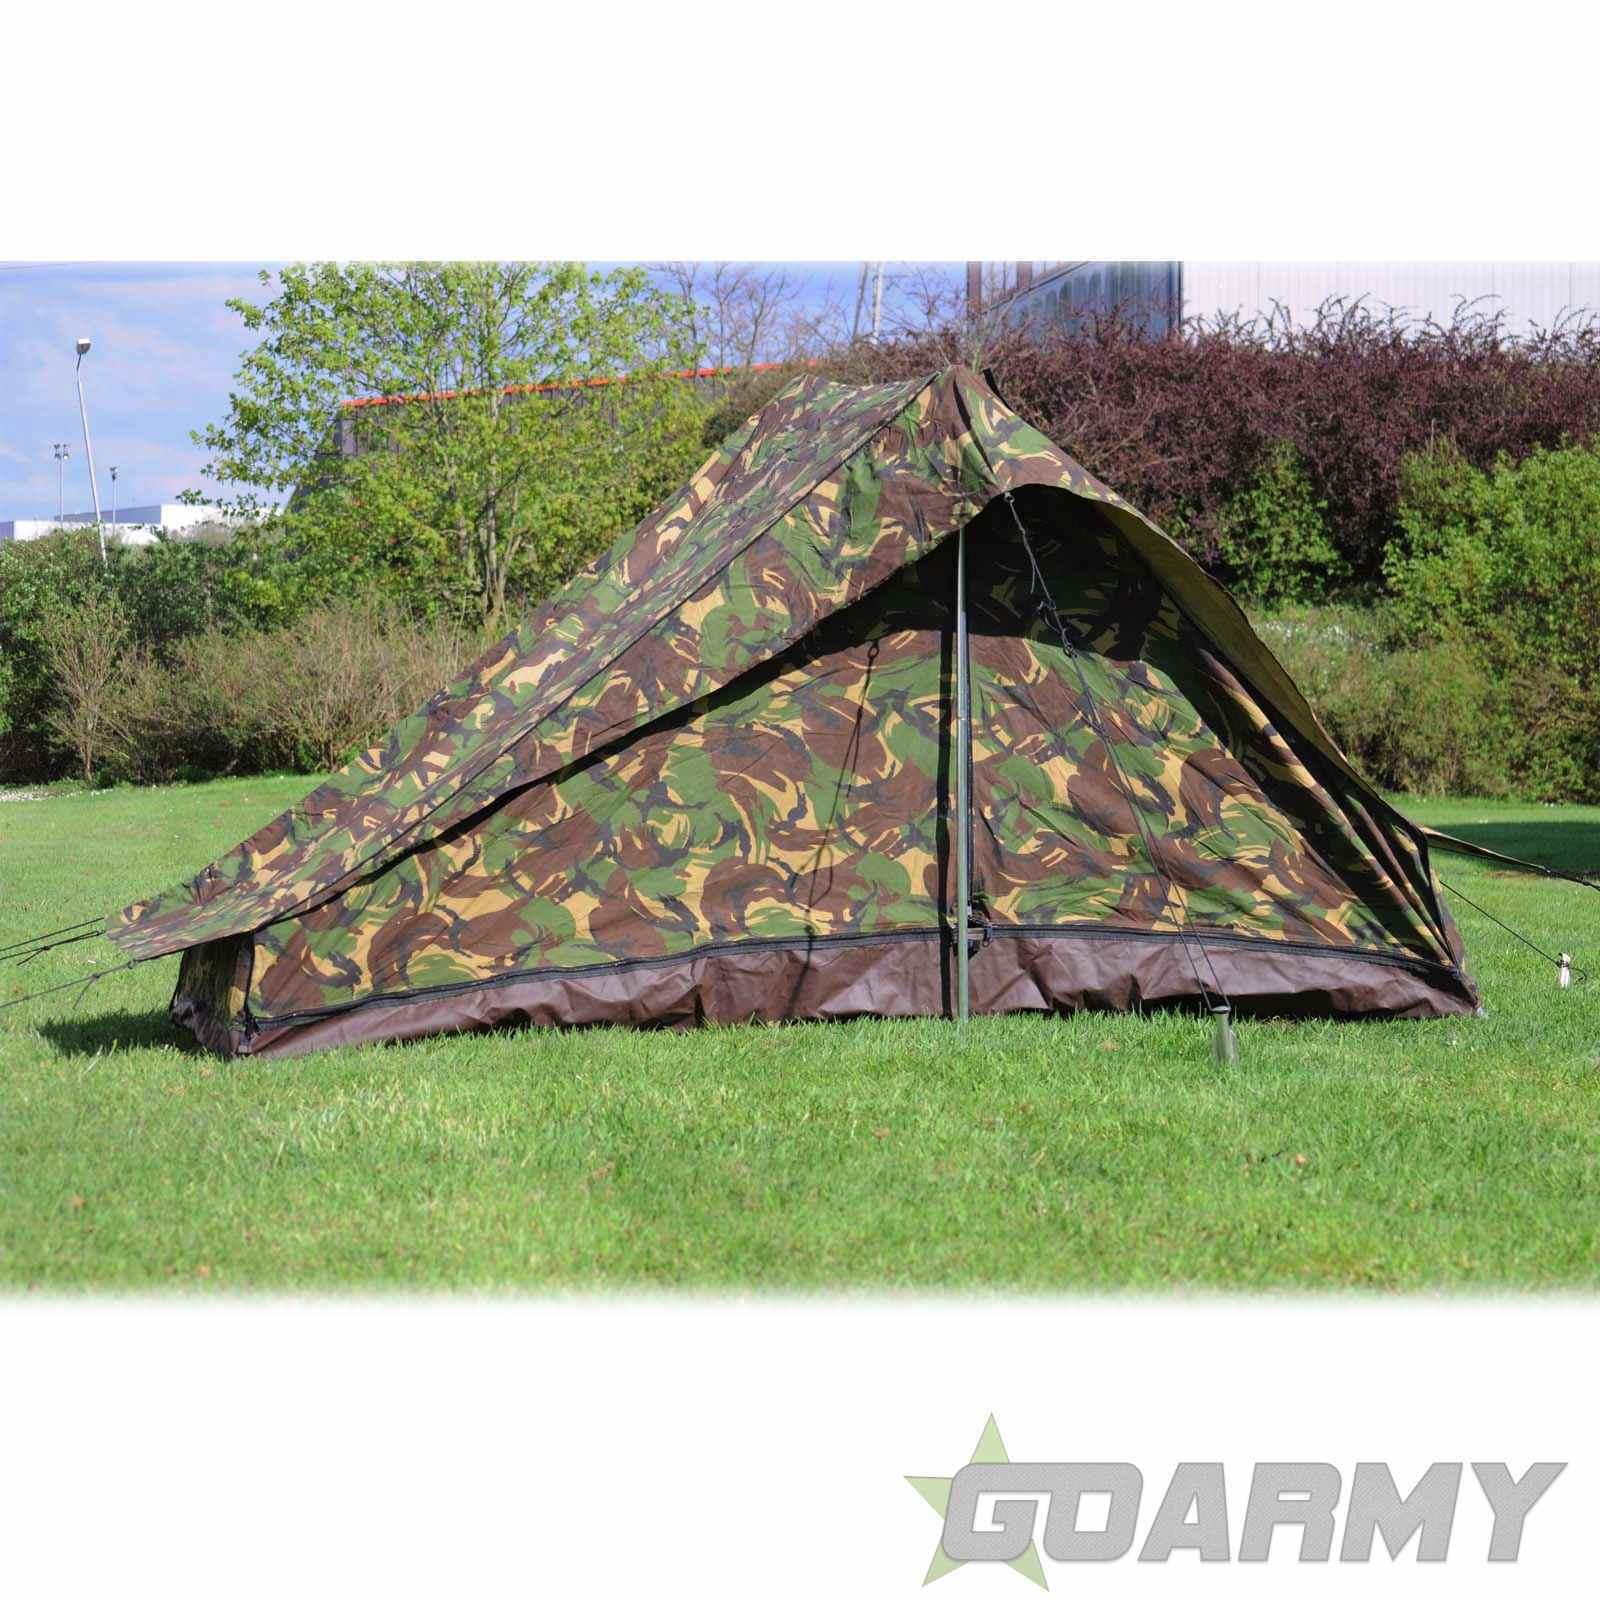 Dutch Army 2 Person Ridge Tent   save 60% discount